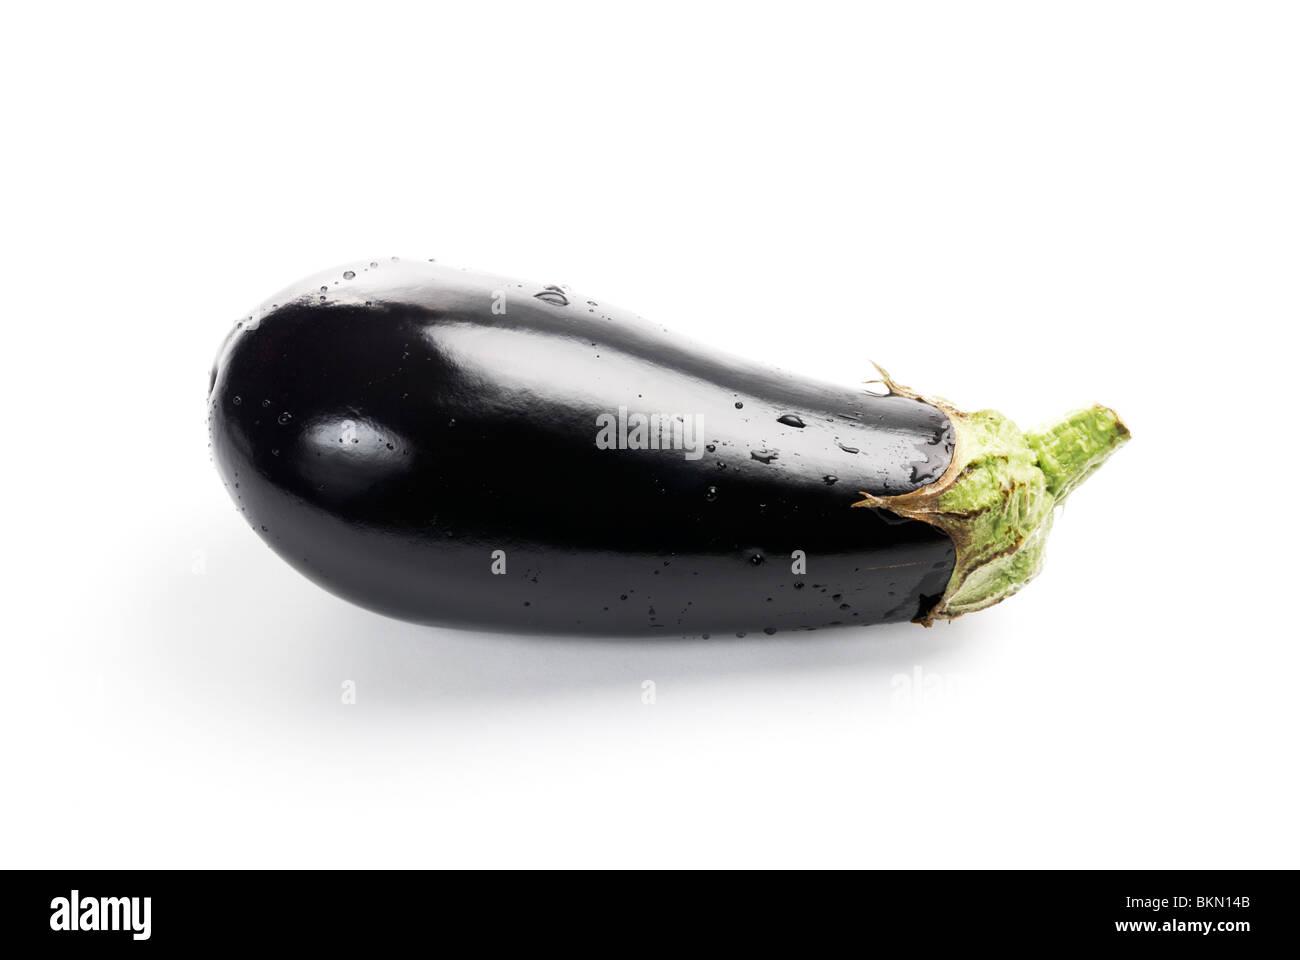 Eggplants, solanum melongena - Stock Image